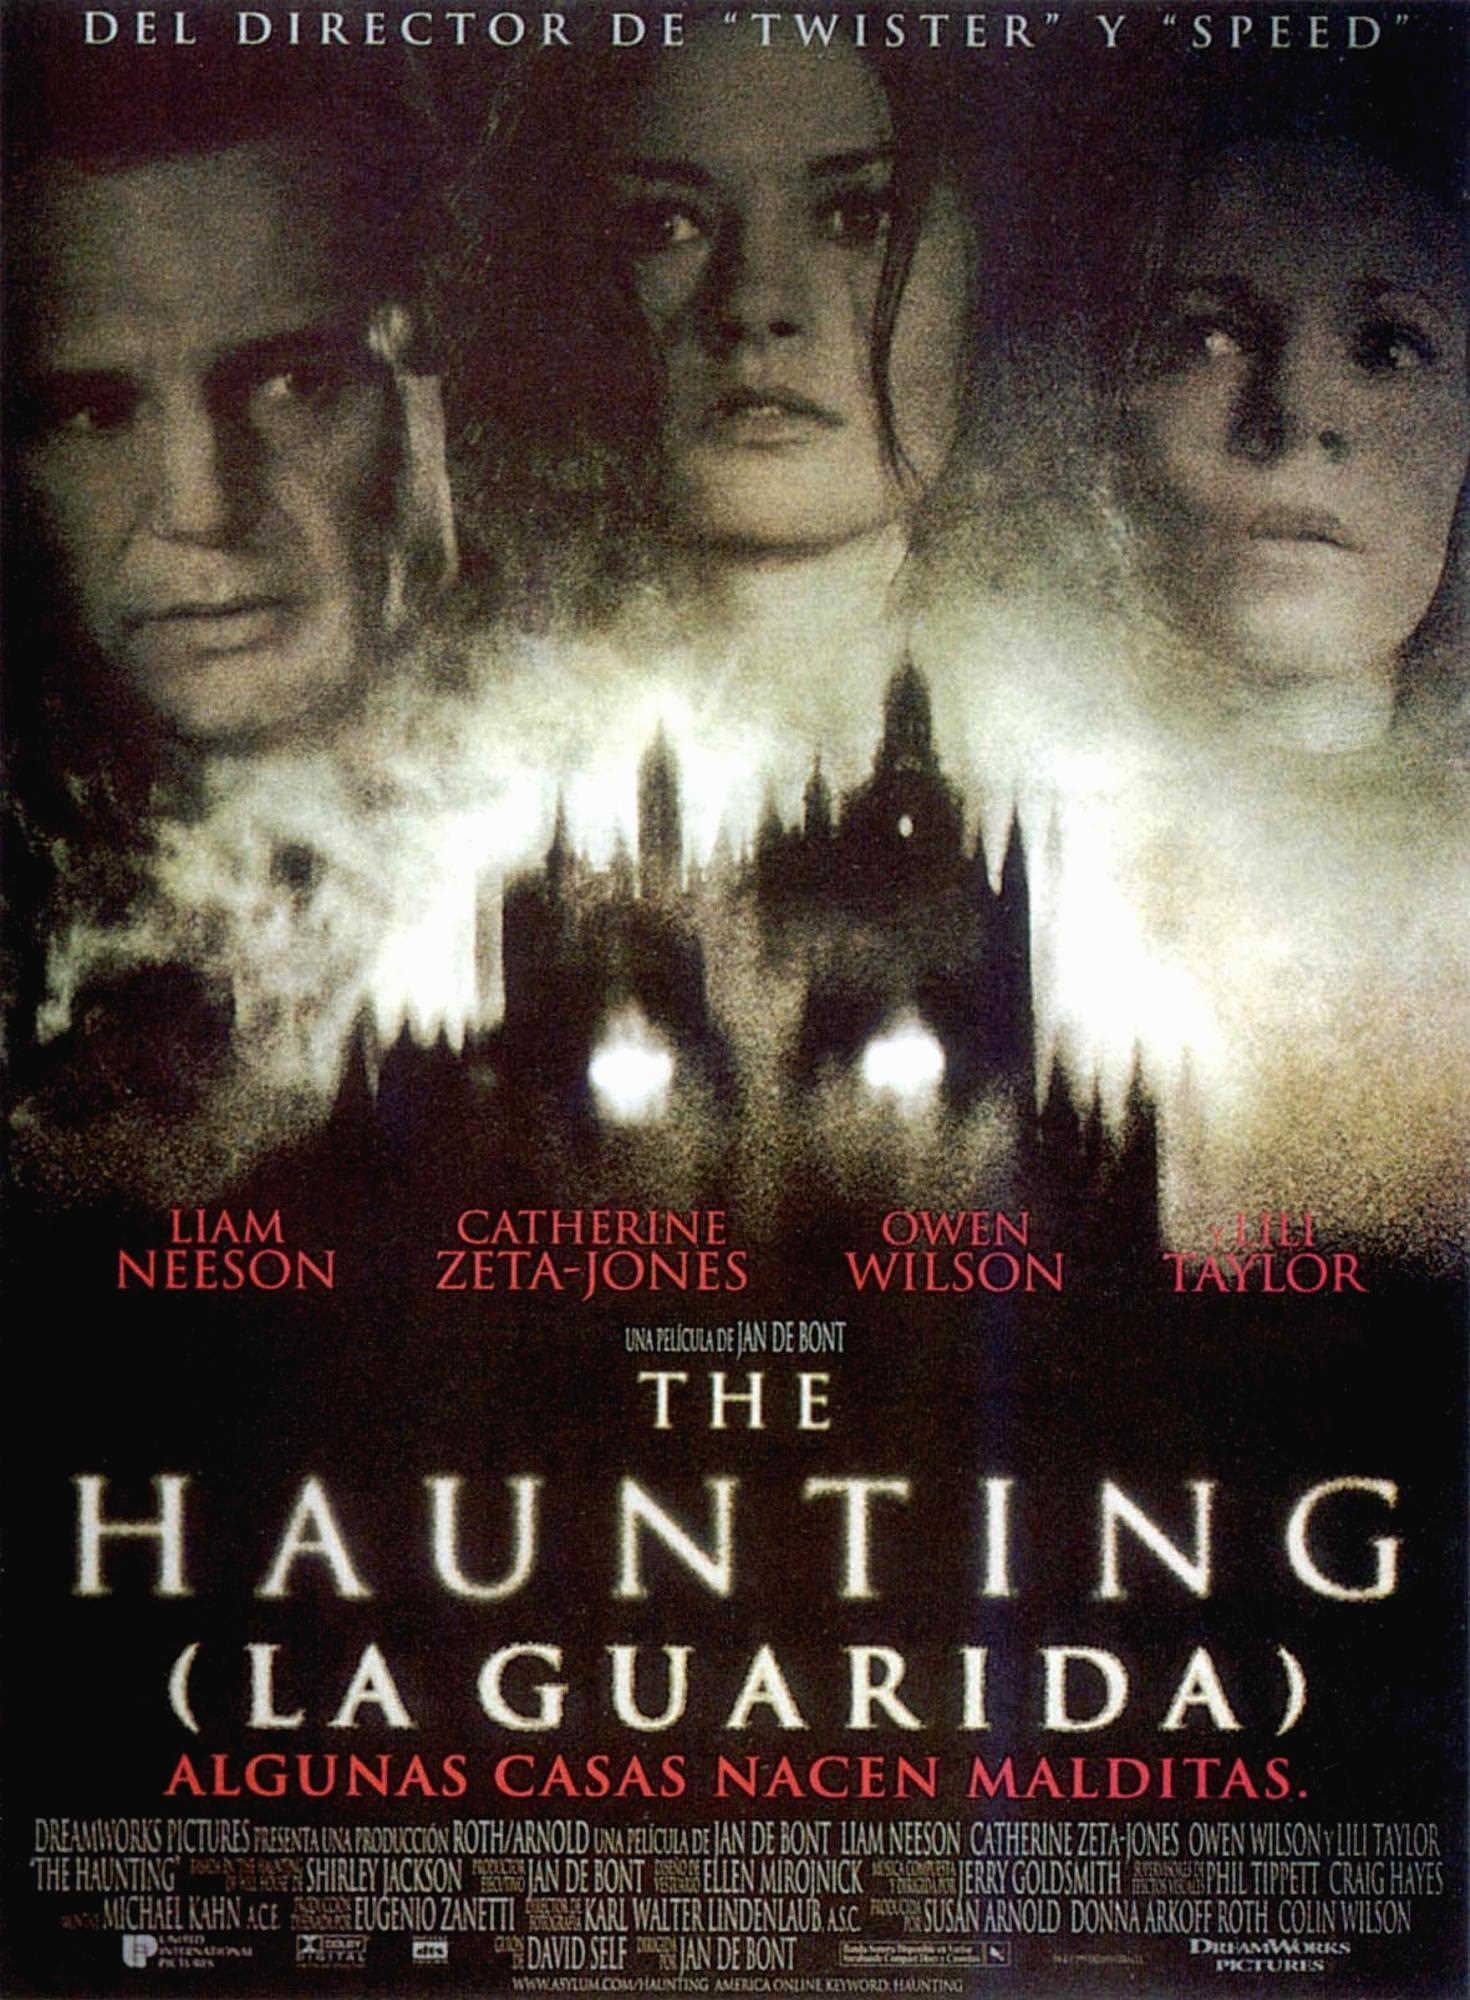 La Guarida 1999 Full Movies Online Free Full Movies Haunting